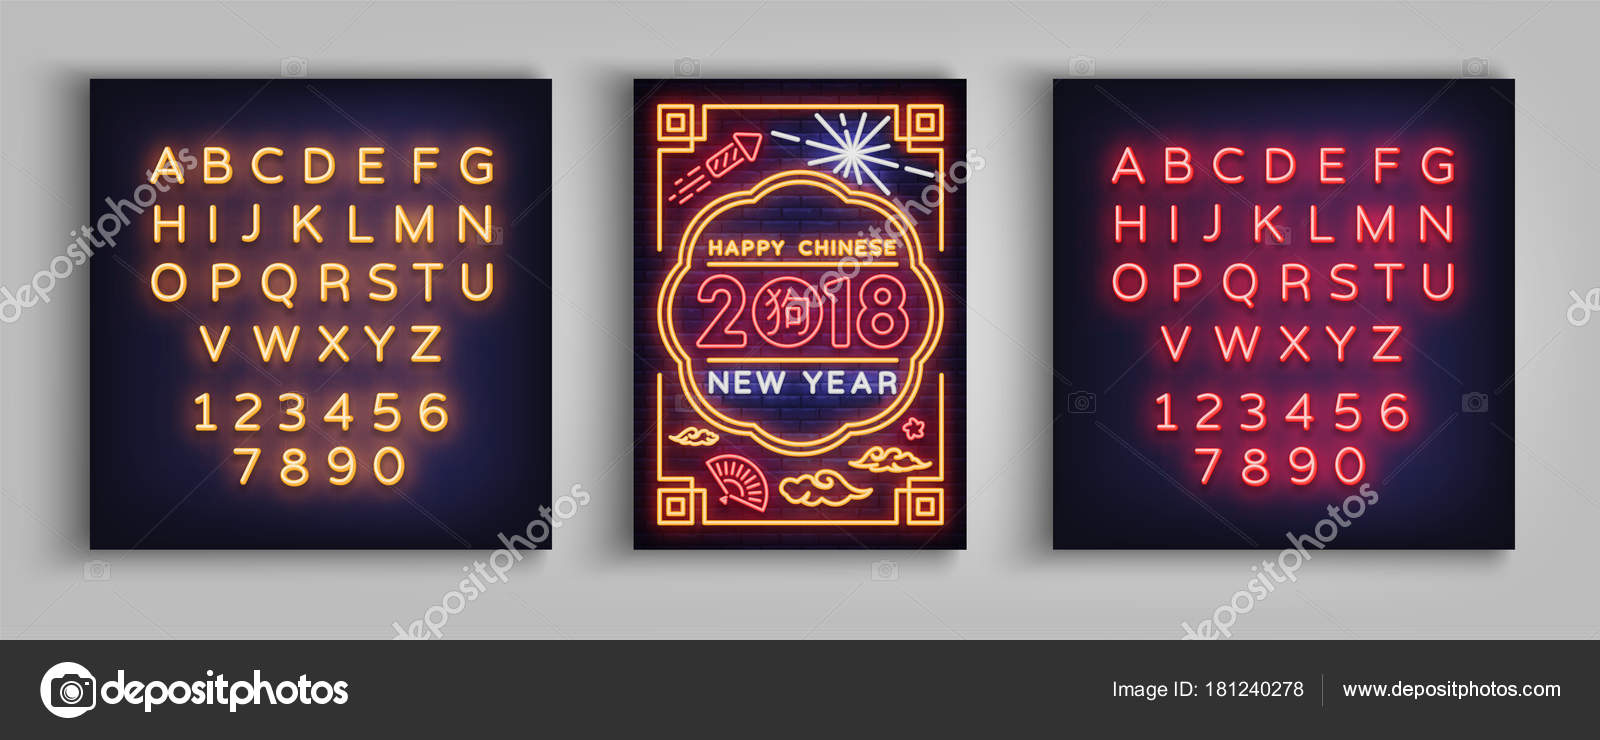 Happy Chinese New Year 2018-Plakat in einem Neon-Stil. Vektor ...